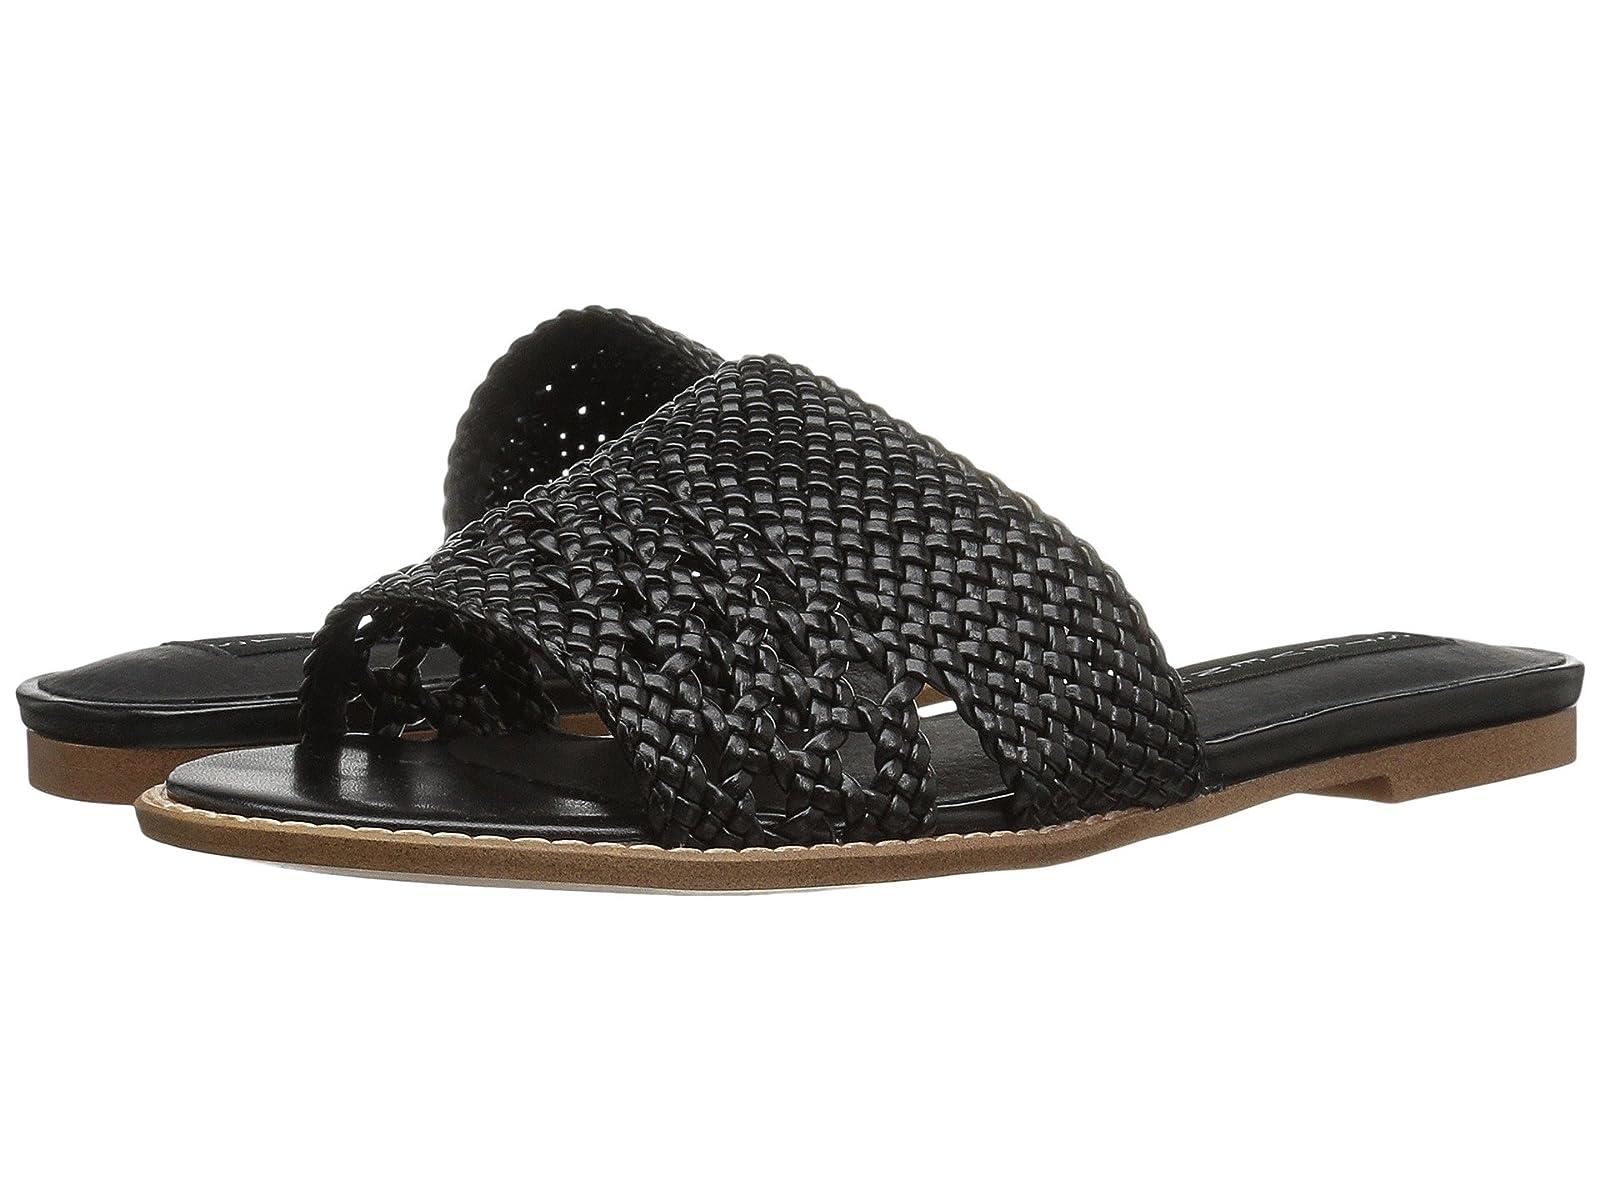 Steven WhitnieCheap and distinctive eye-catching shoes